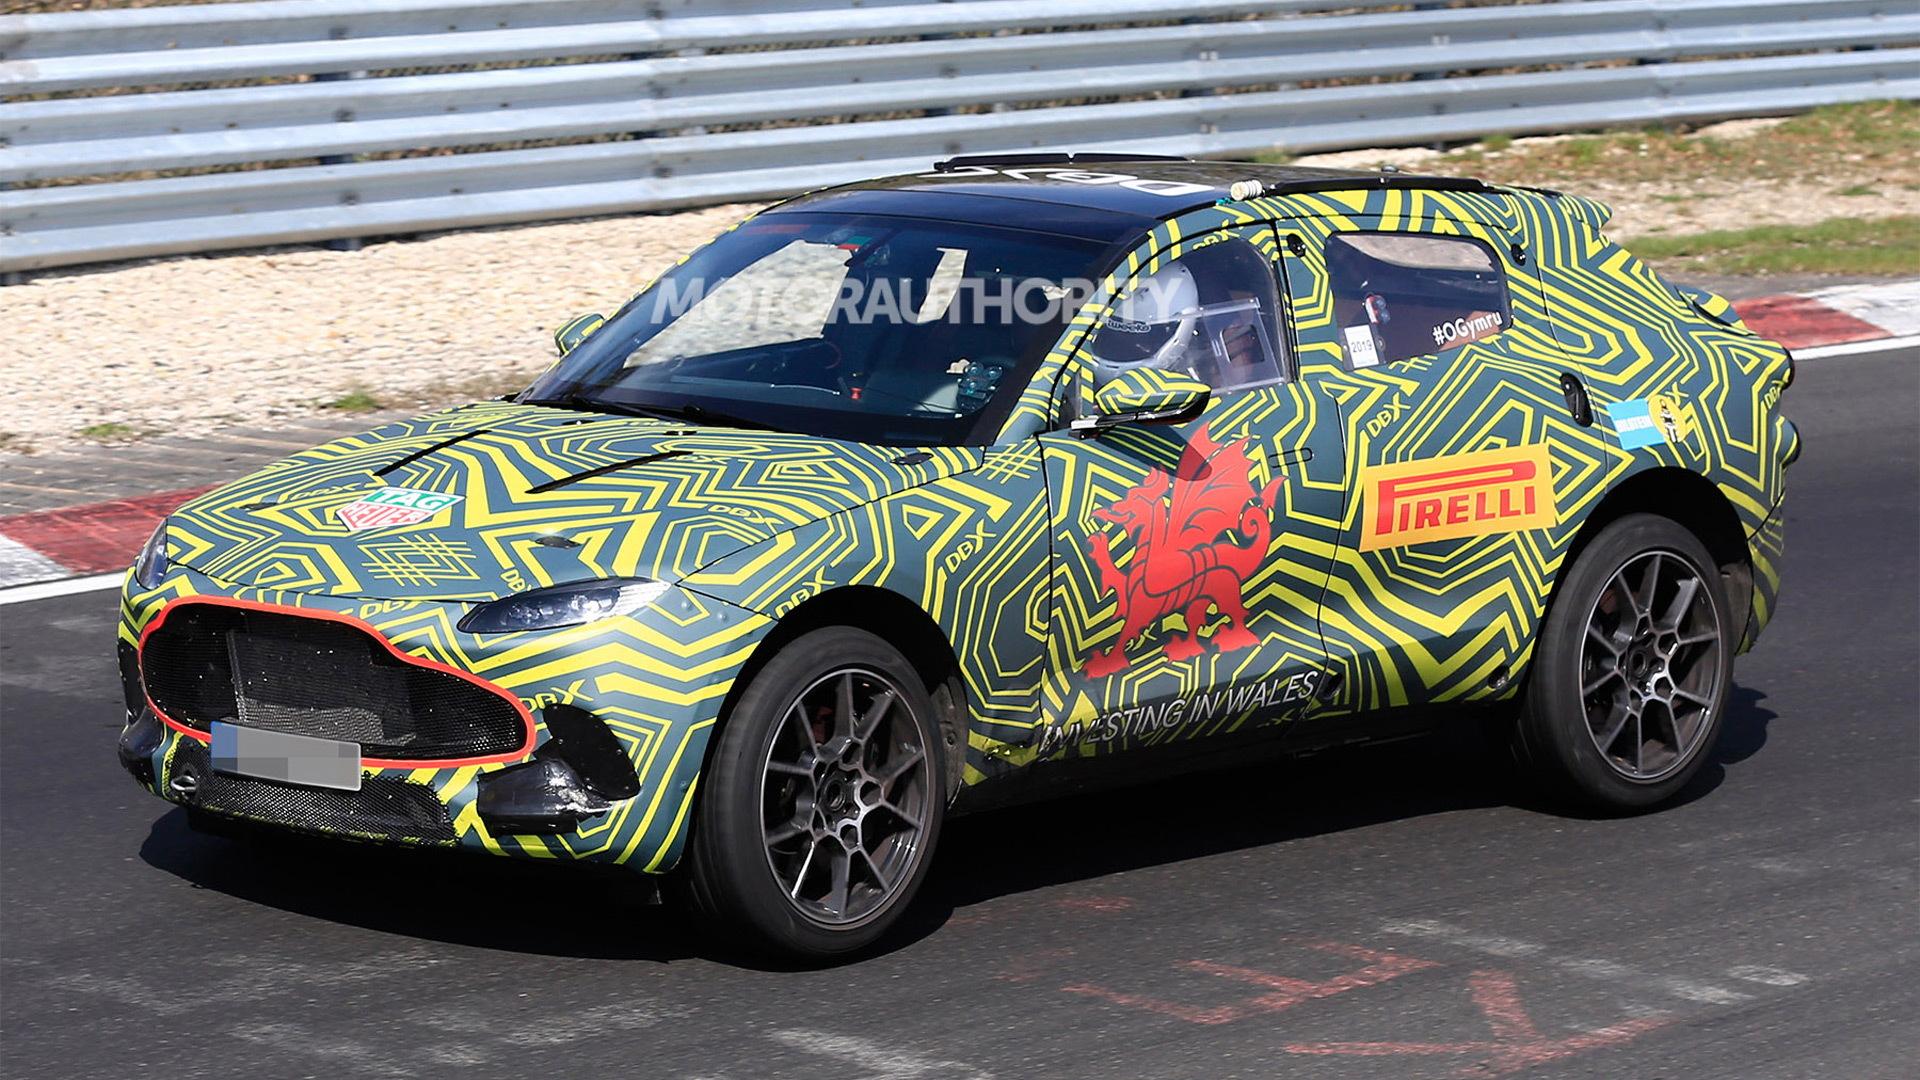 2020 Aston Martin DBX spy shots - Image via S. Baldauf/SB-Medien